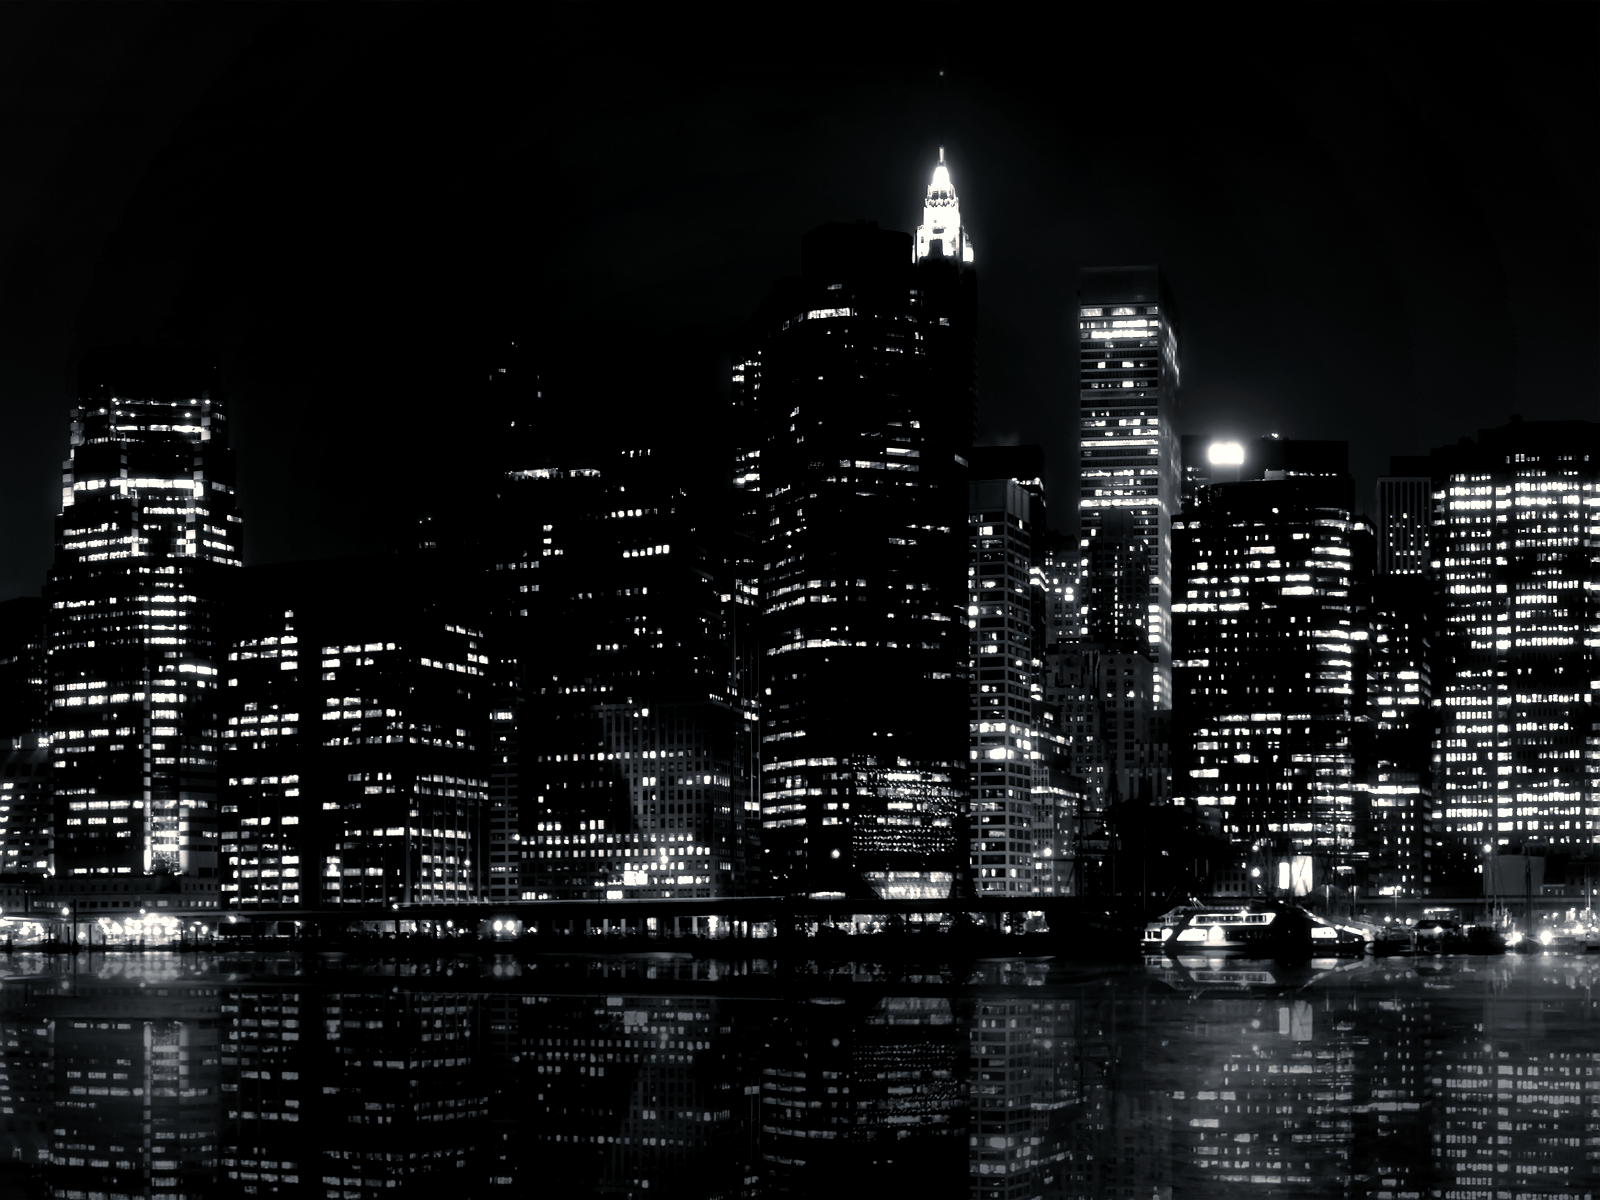 city background 18298